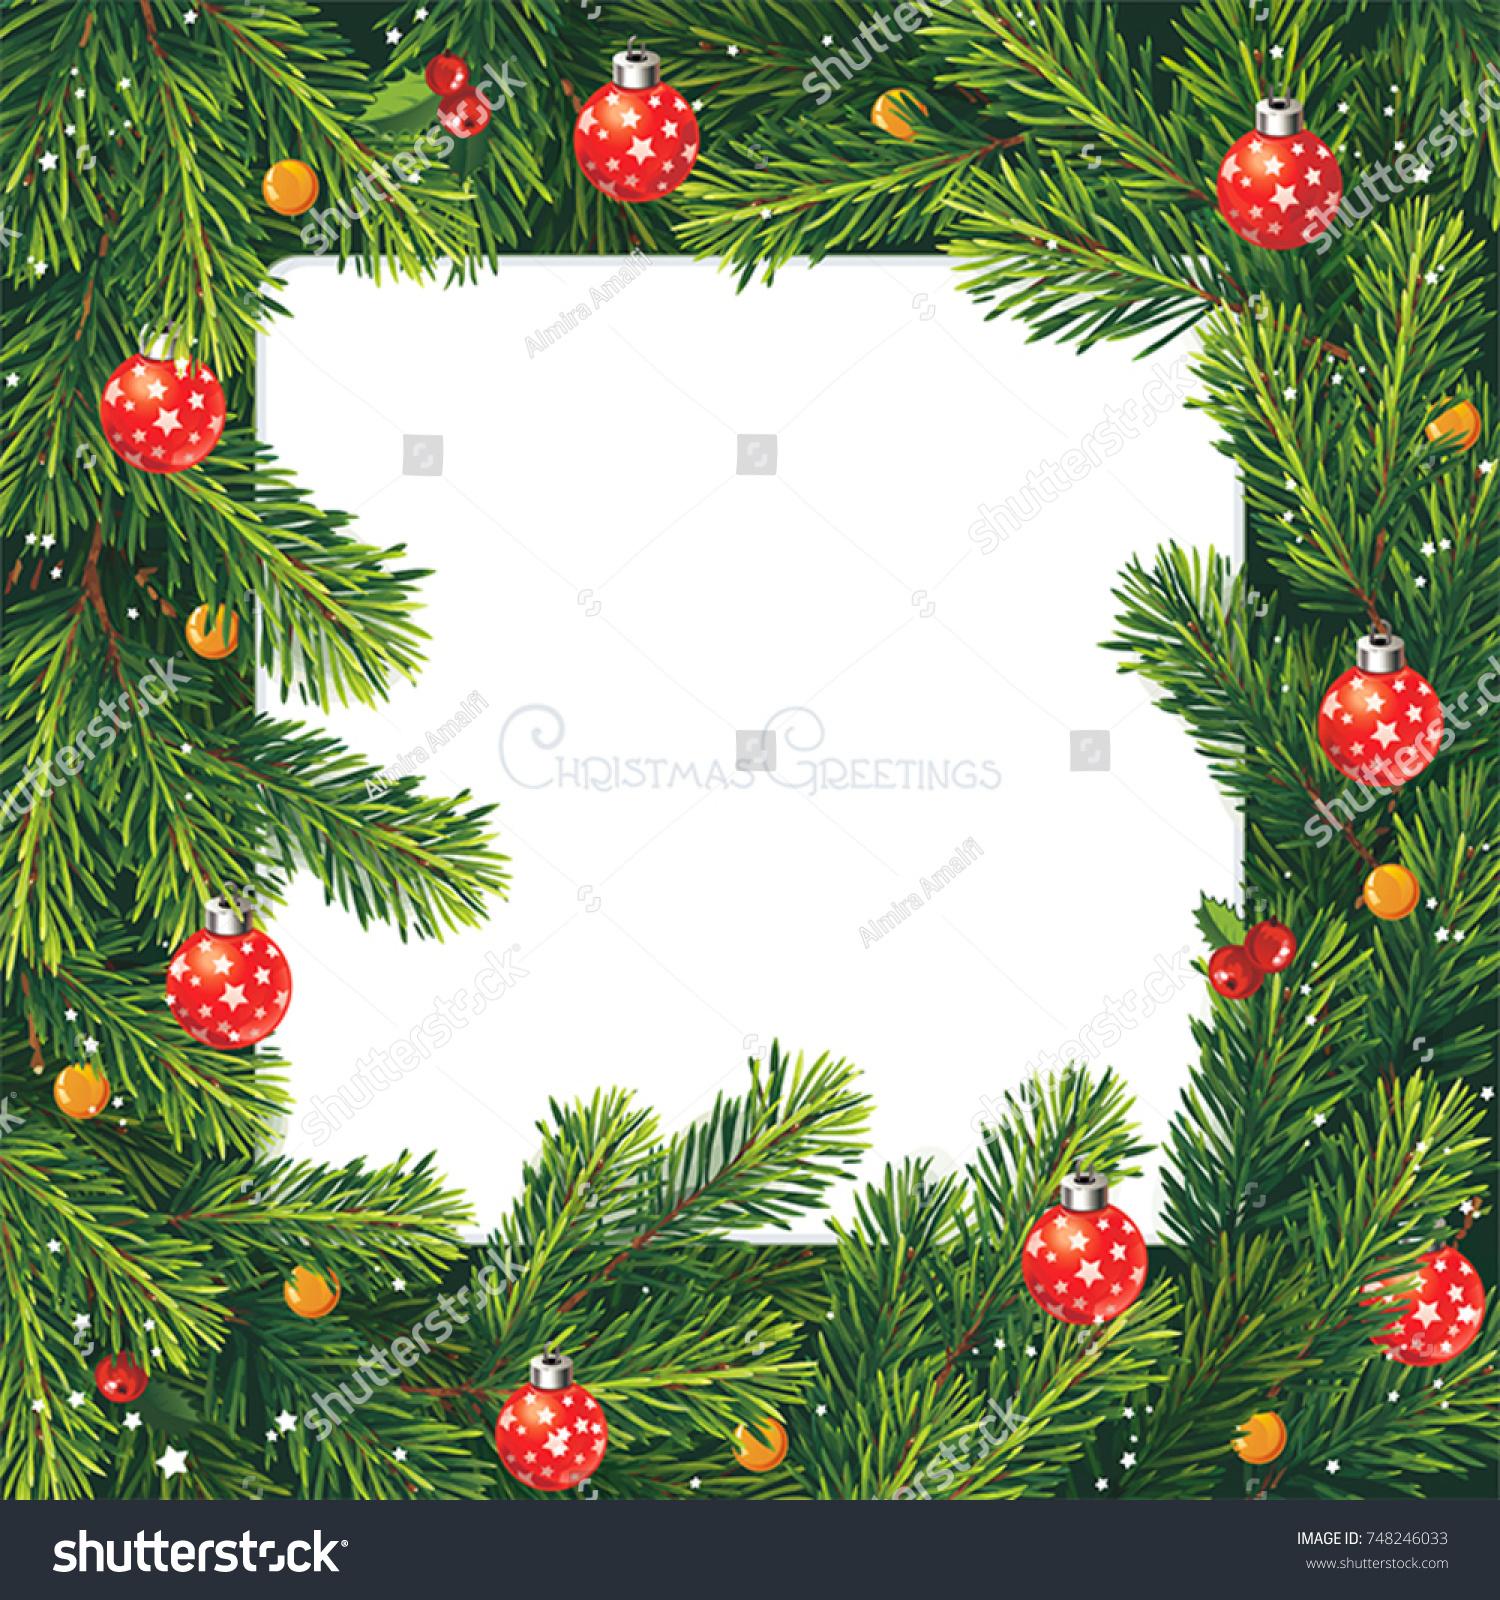 Christmas Party Invitation Fir Pine Holly Stock Vector 748246033 ...